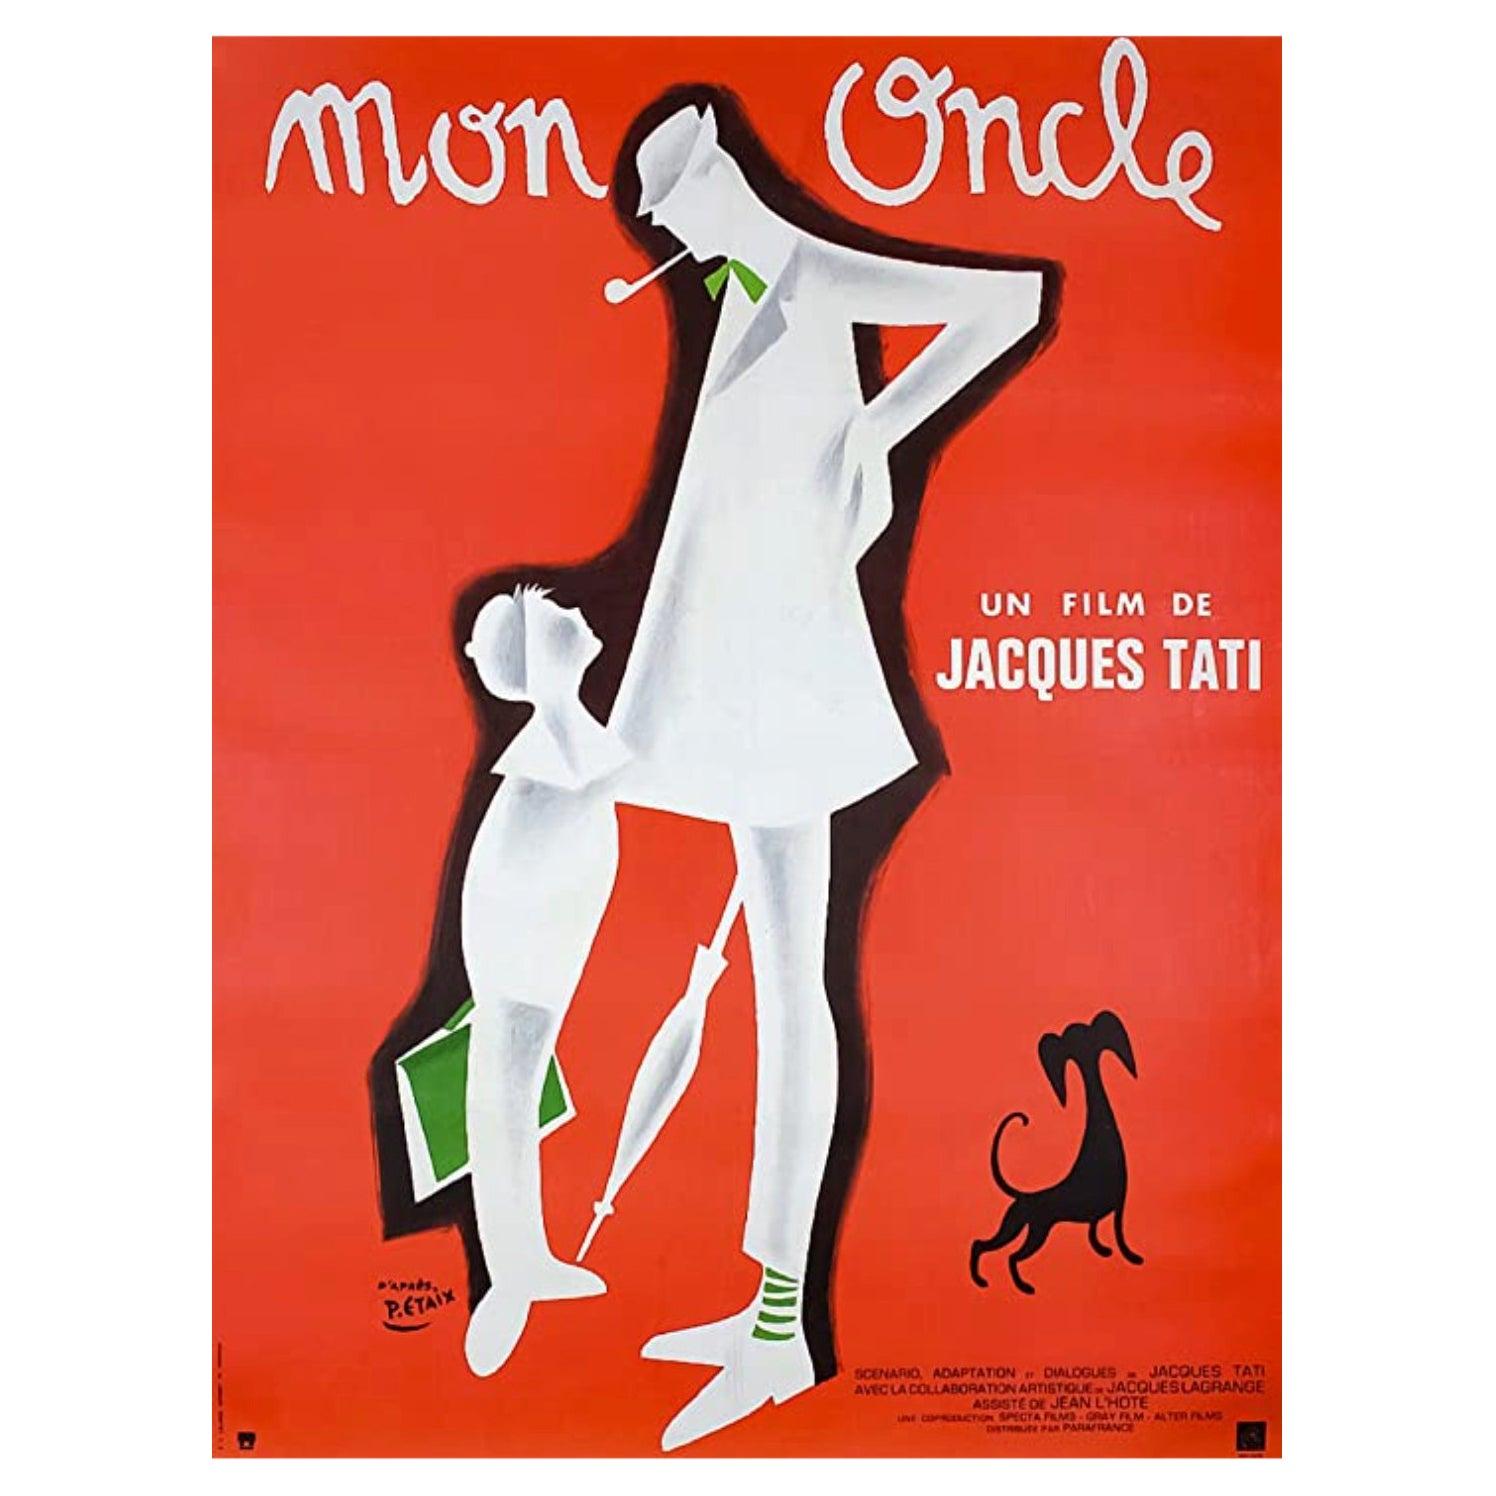 Original Vintage Film Poster, Mon Oncle with Jacques Tati 1959